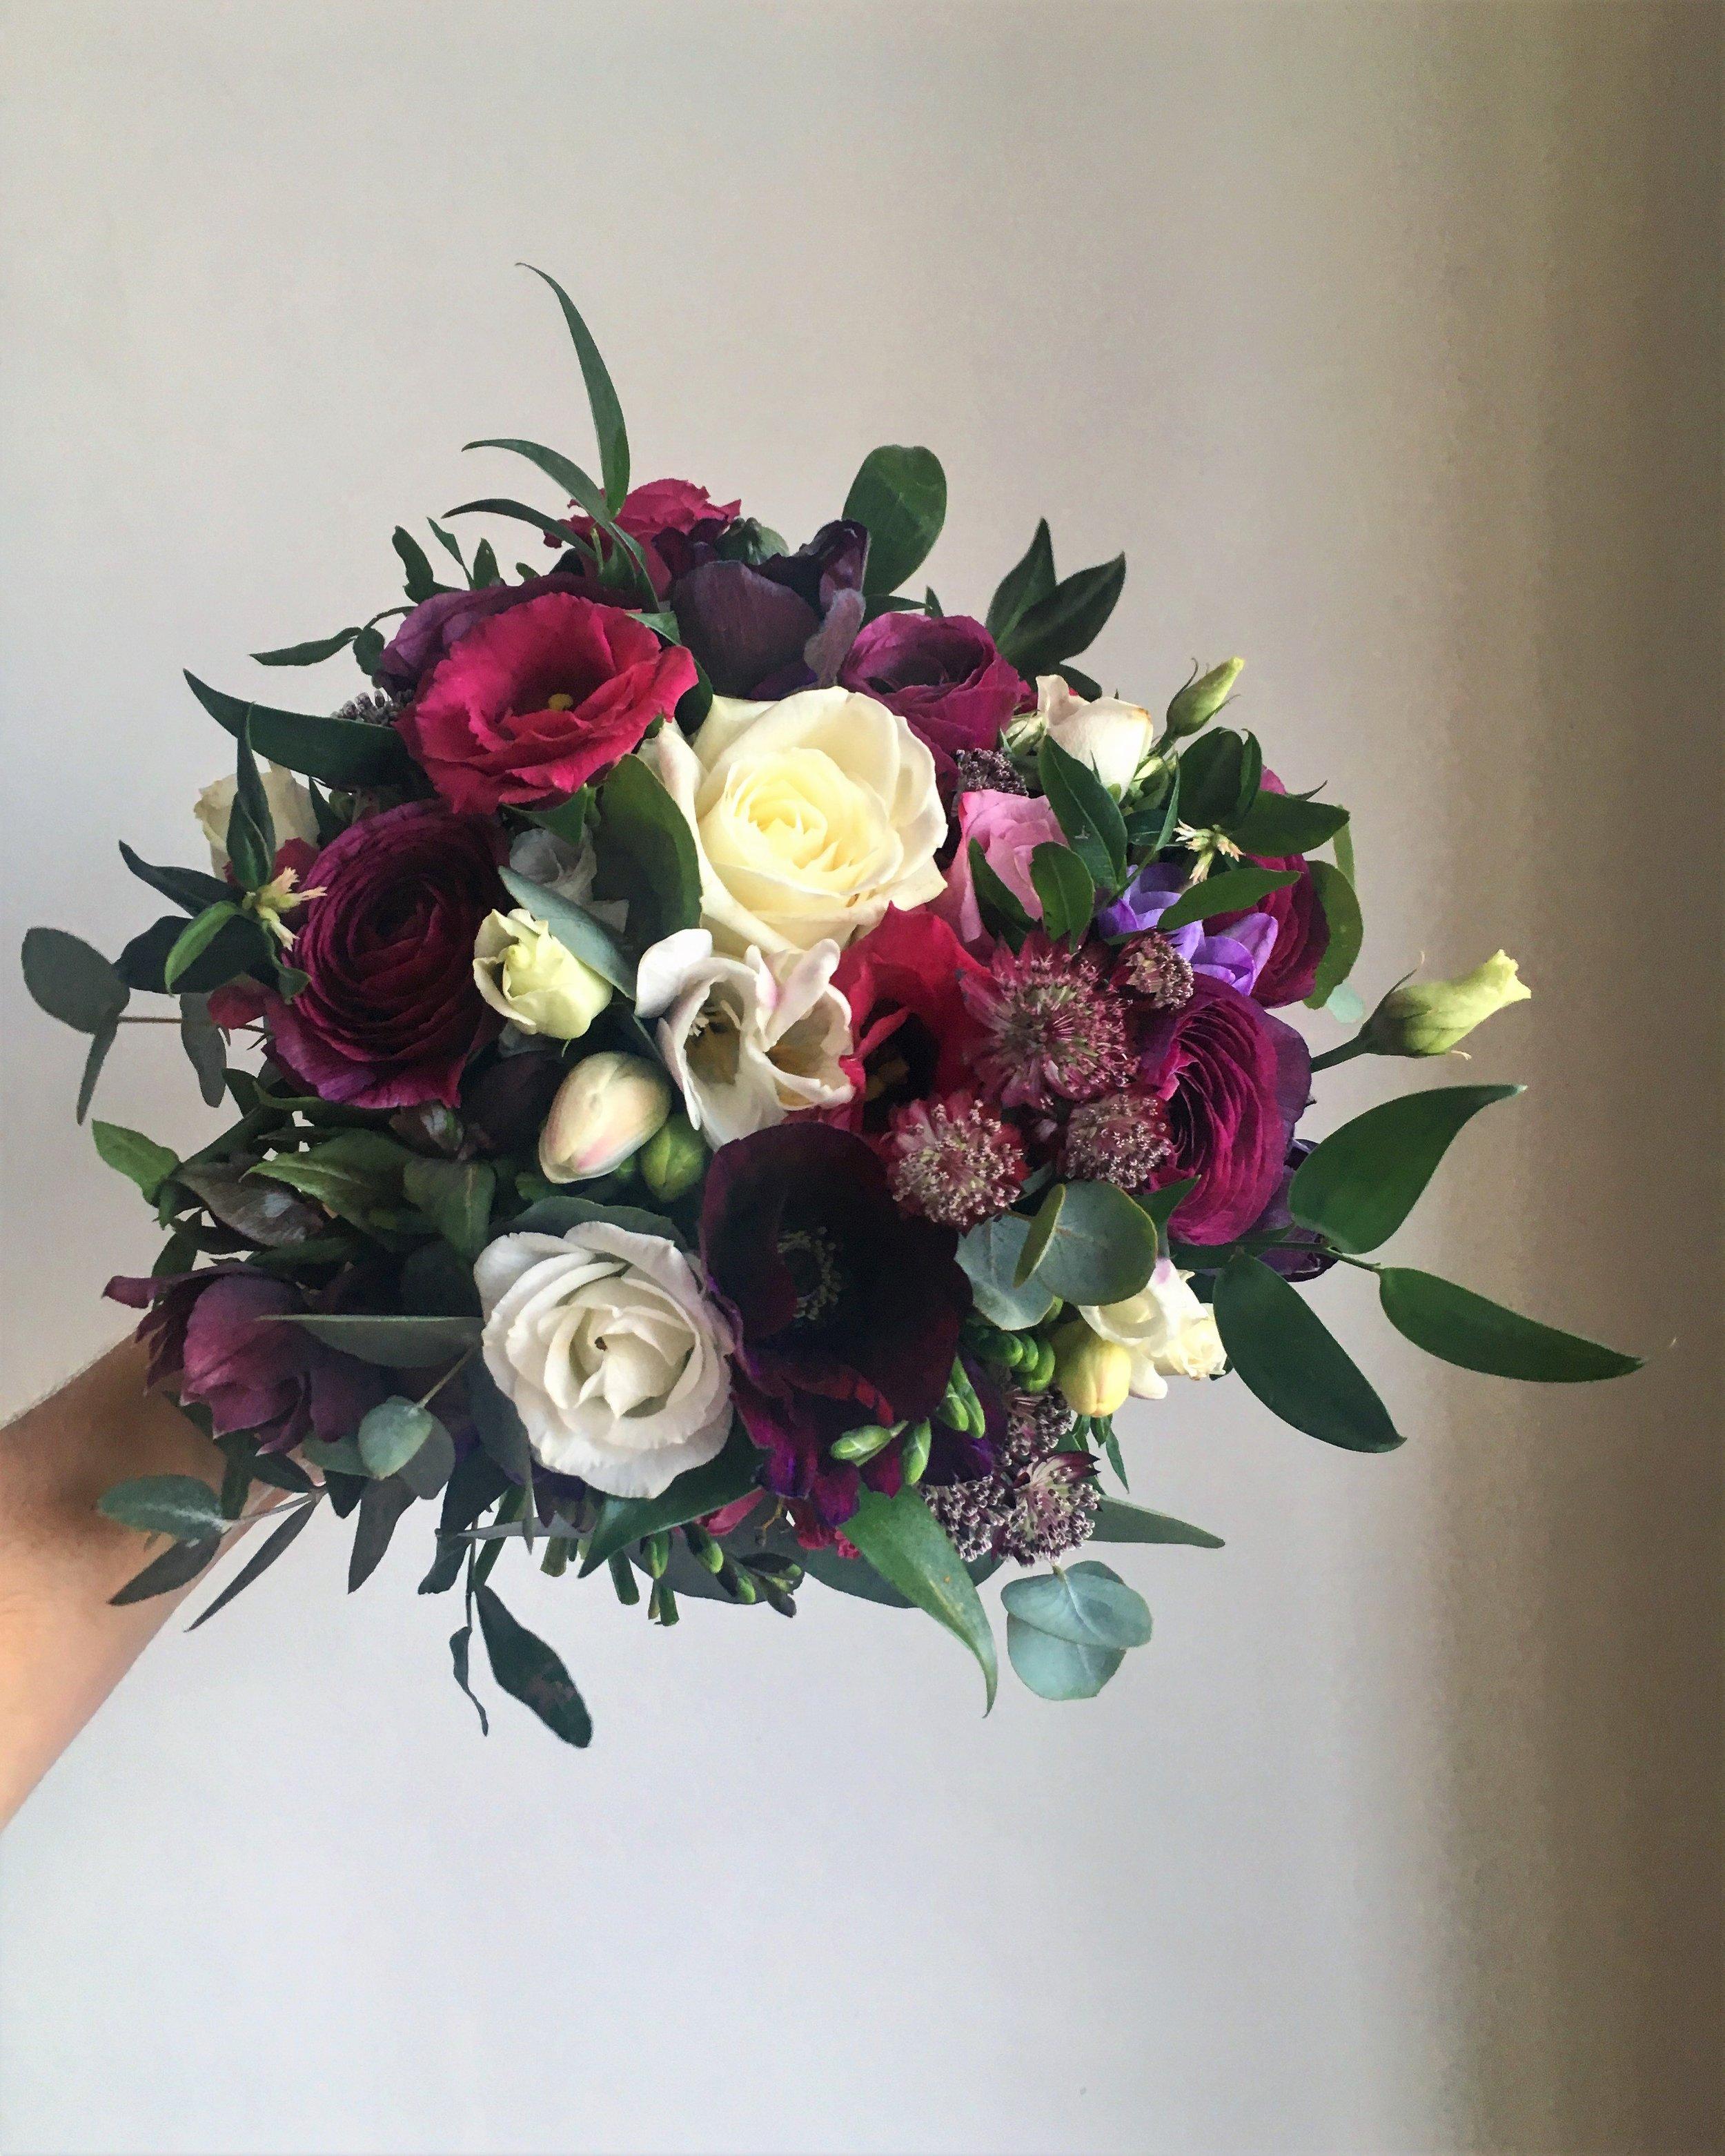 Webb-and-Farrer-Florist-Brighton-Sussex-Wedding-Flowers (18).JPG